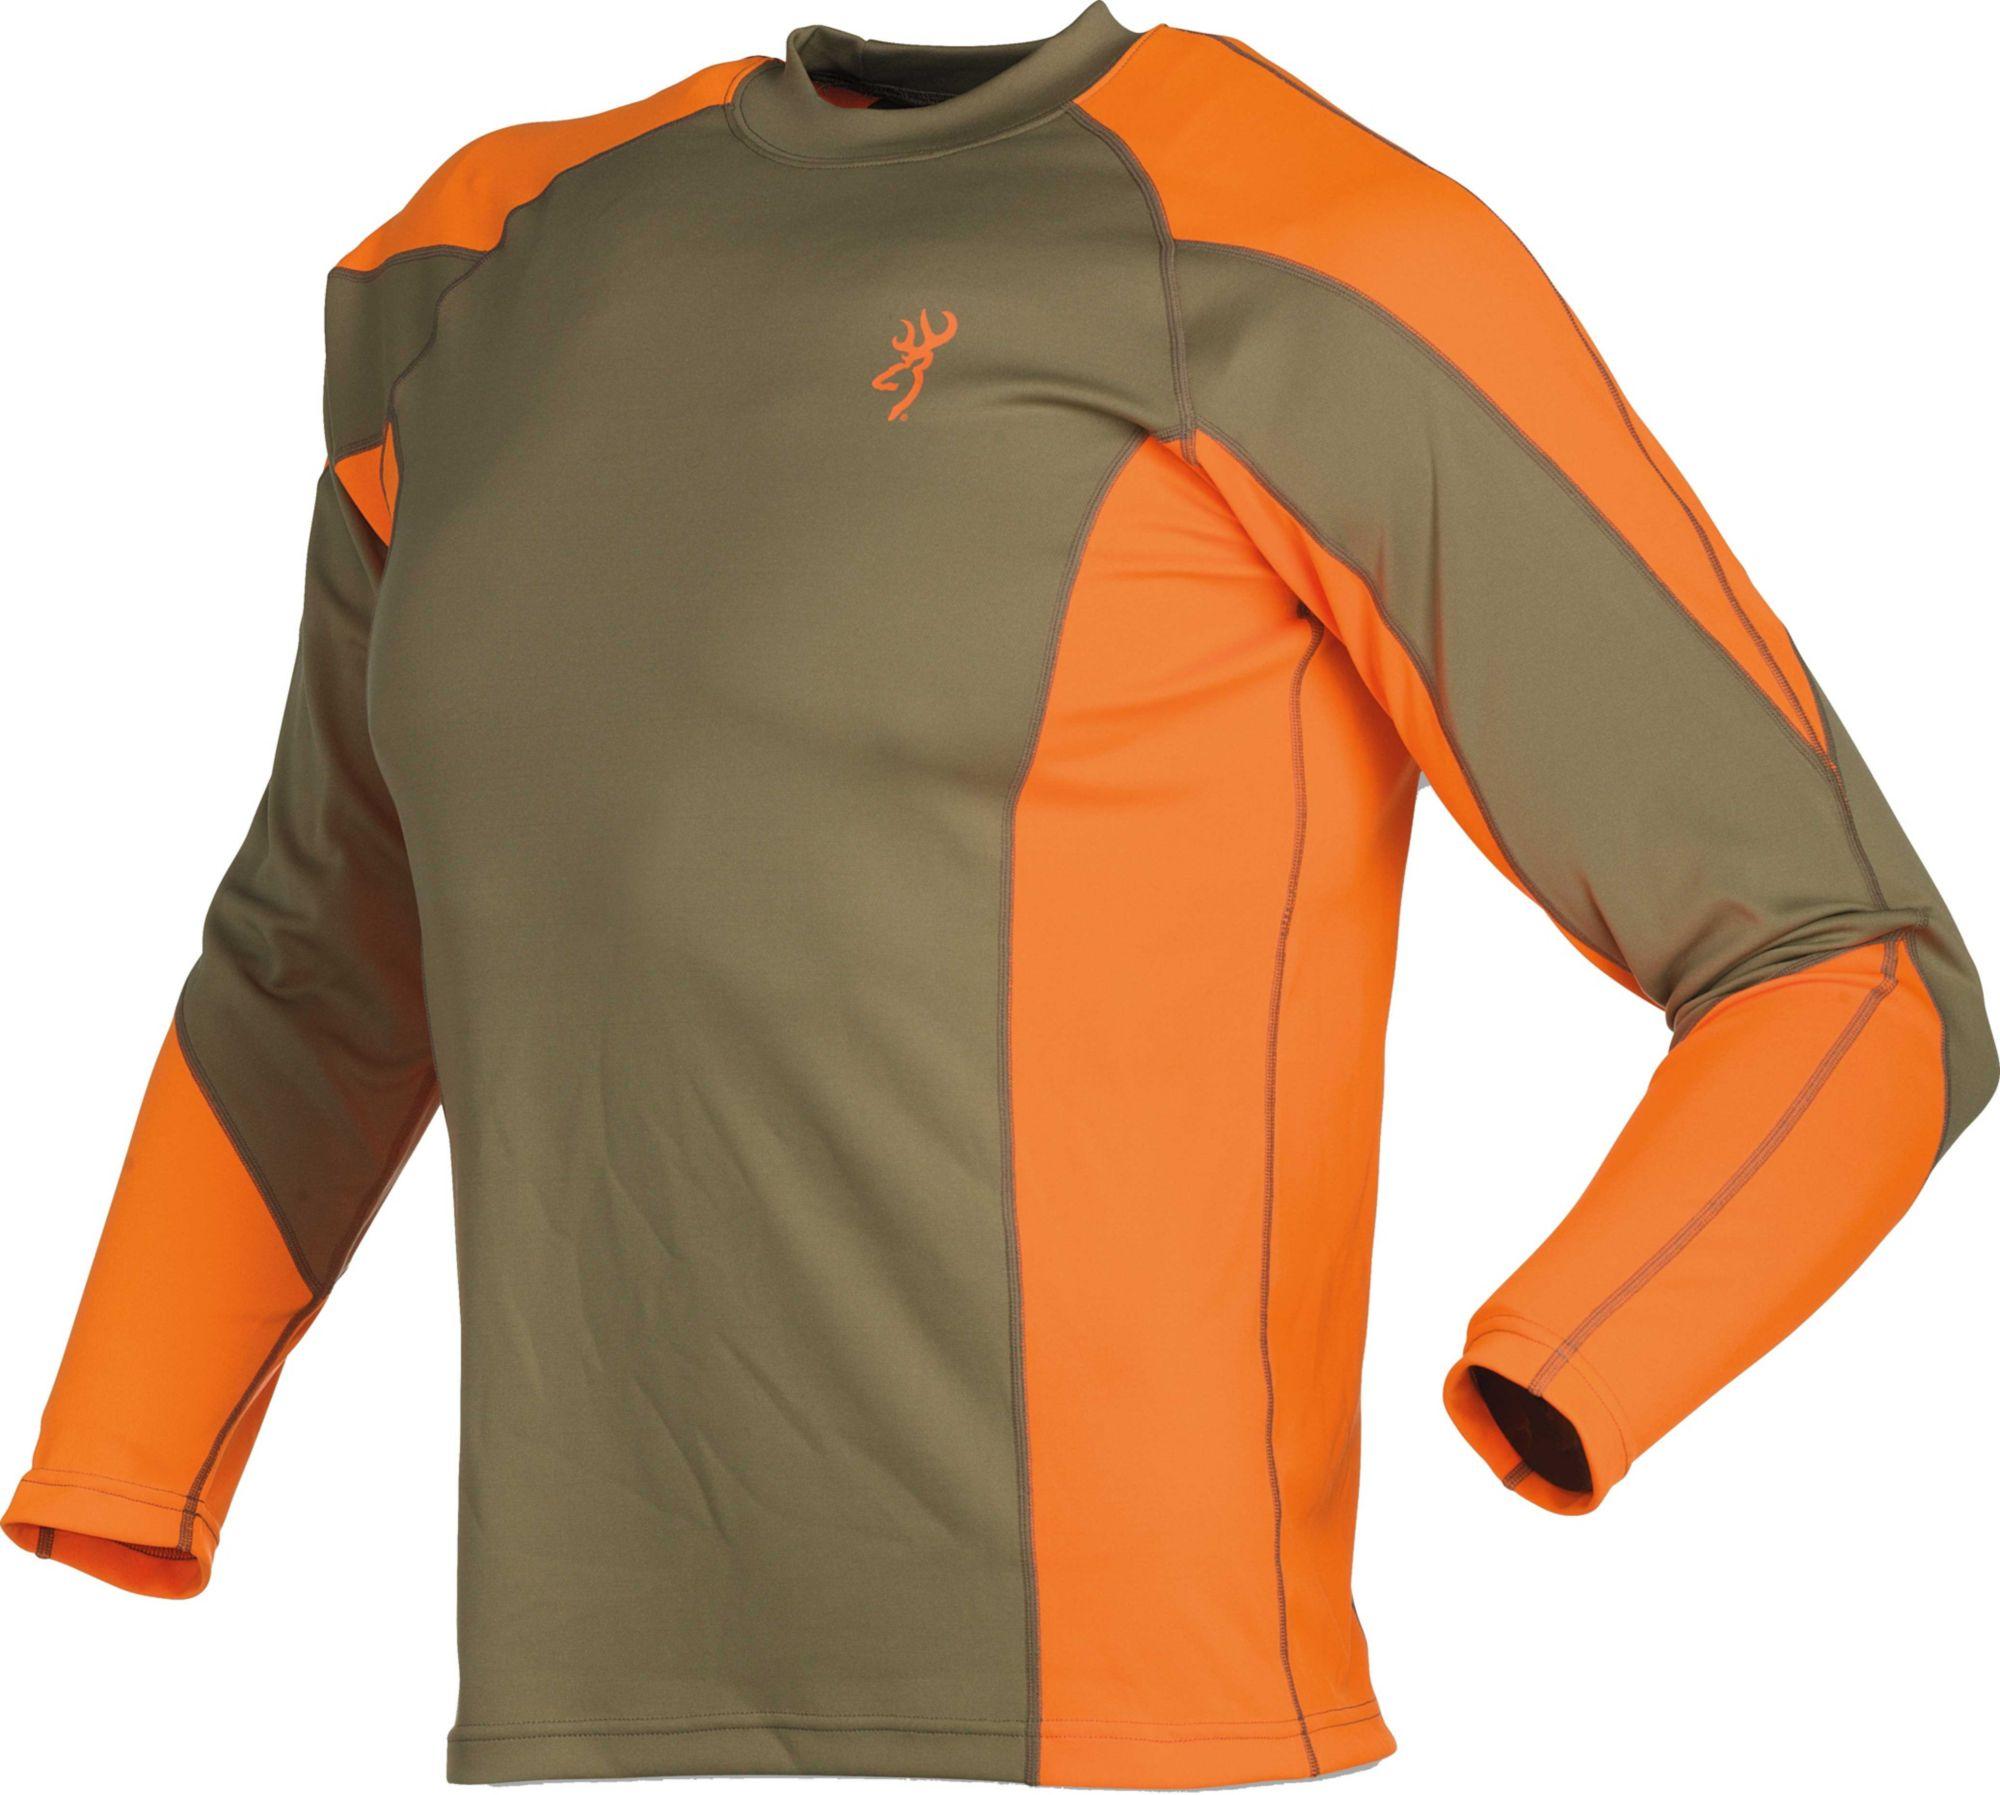 Browning NTS Upland Shirt, Men's, Size: Medium, Blaze Orange thumbnail